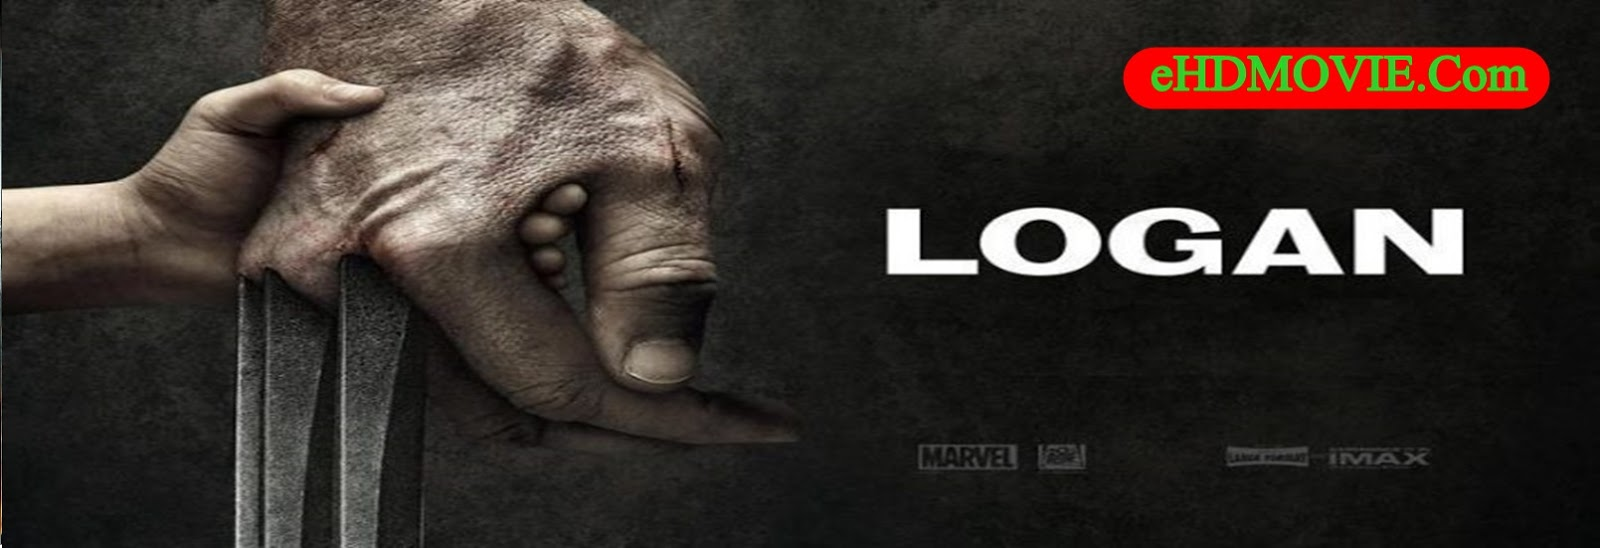 Logan 2017 Full Movie Dual Audio [Hindi – English] 1080p - 720p - HEVC - 480p ORG BRRip 400MB - 600MB - 1.4GB - 2.6GB ESubs Free Download